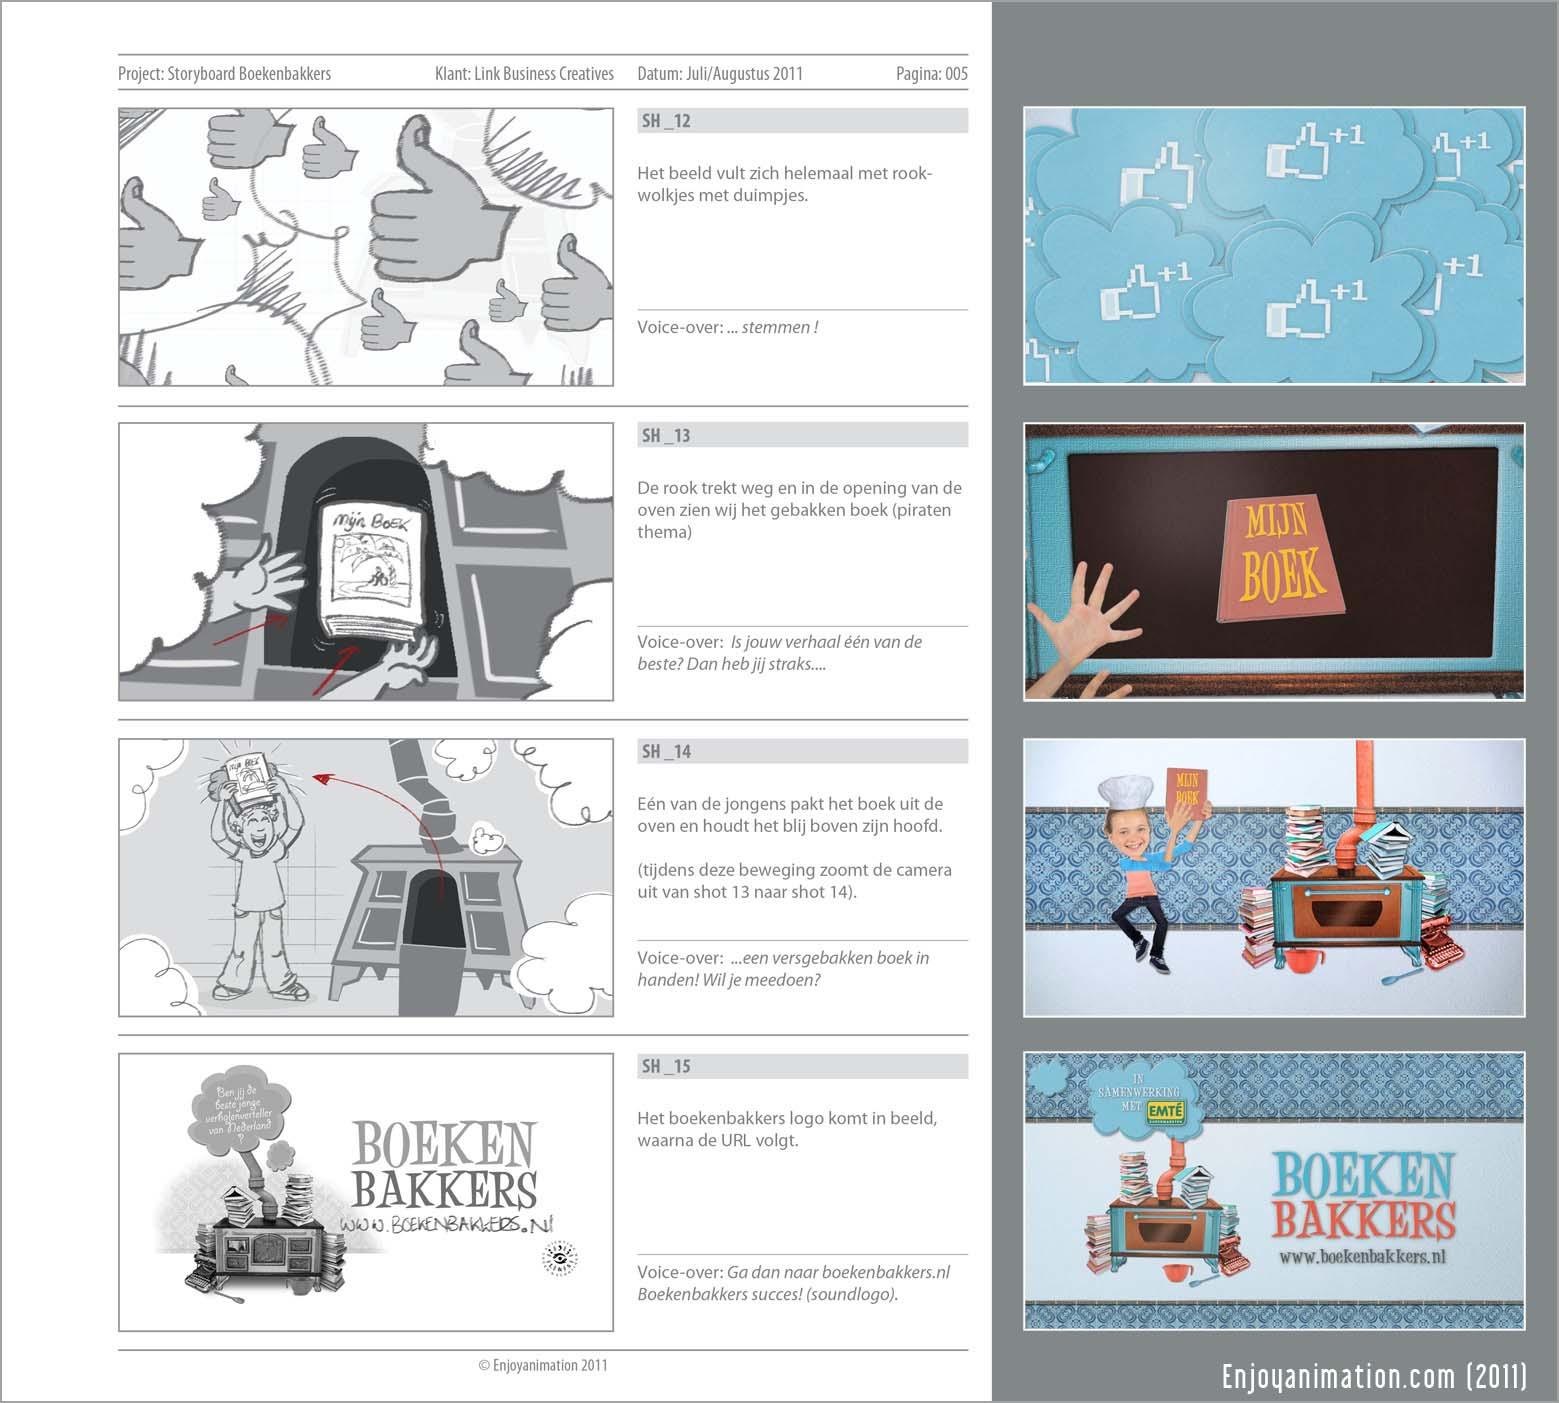 Storyboard For Website Design: Enjoyanimation's Blog: Storyboard Boekenbakkers Promo